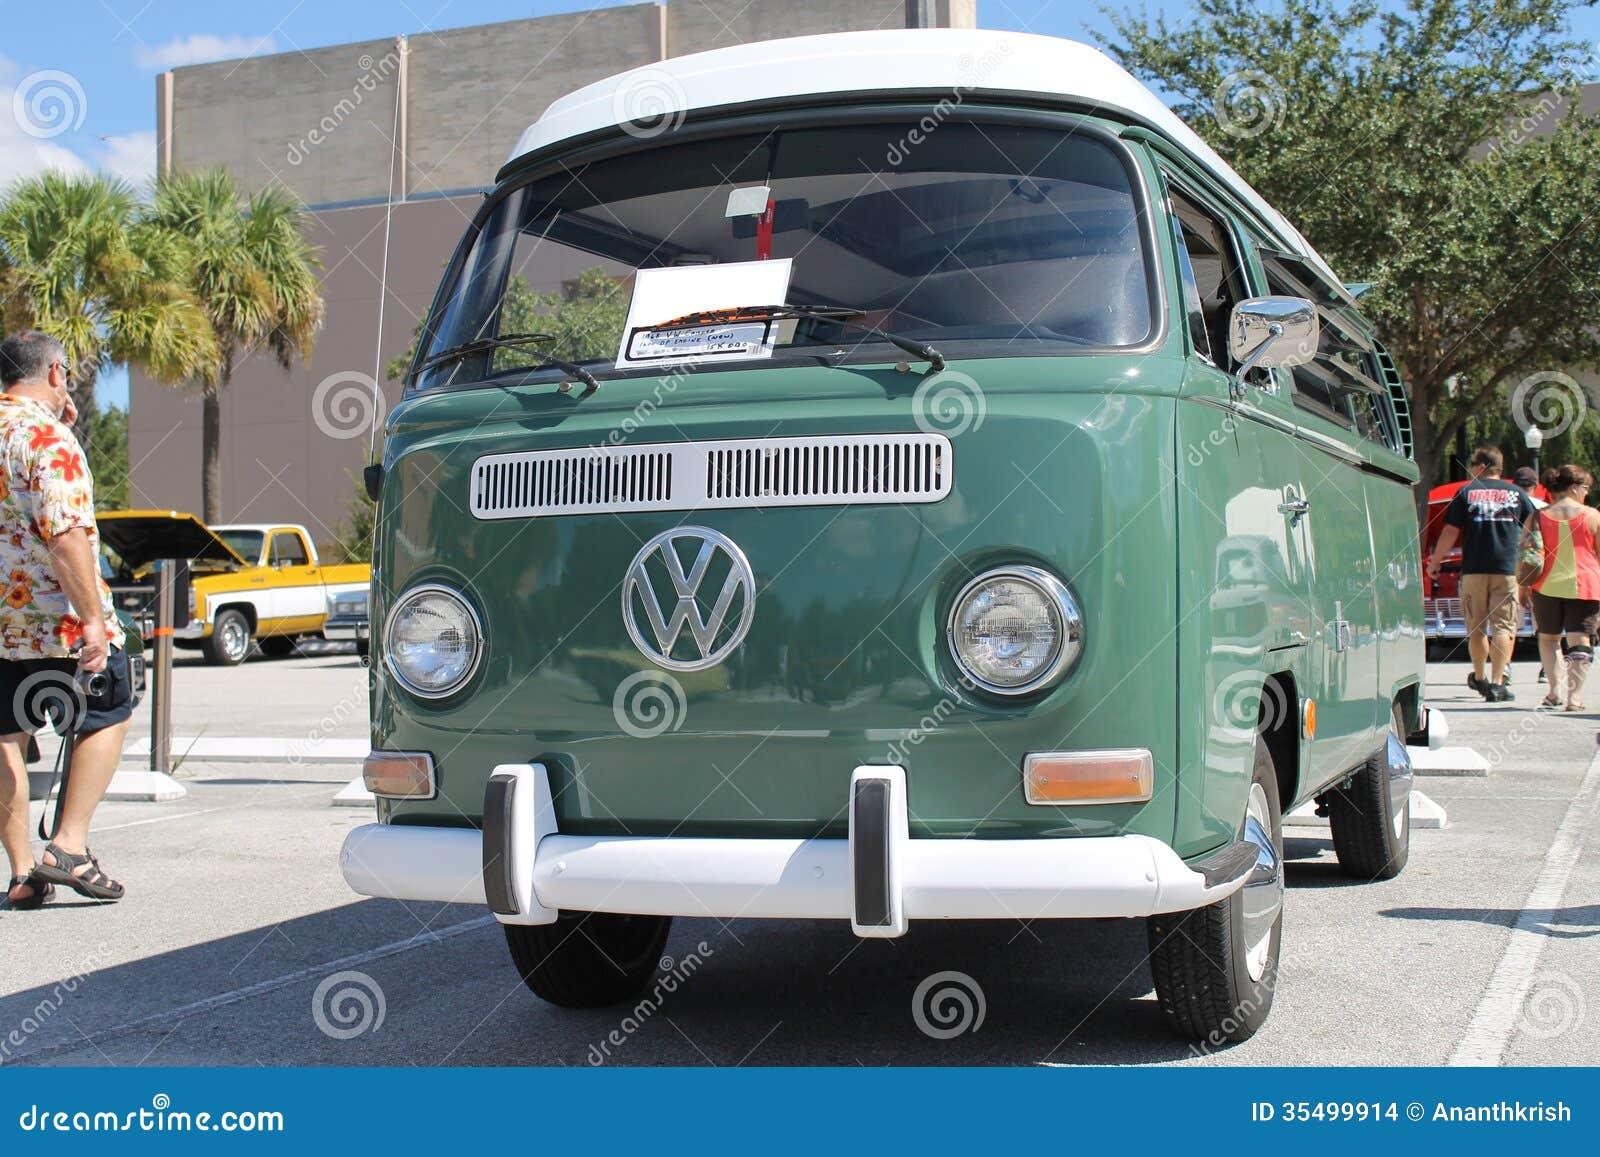 Old Volkswagen Van Car Show Stock Images Download Photos - Lakeland florida car show 2018